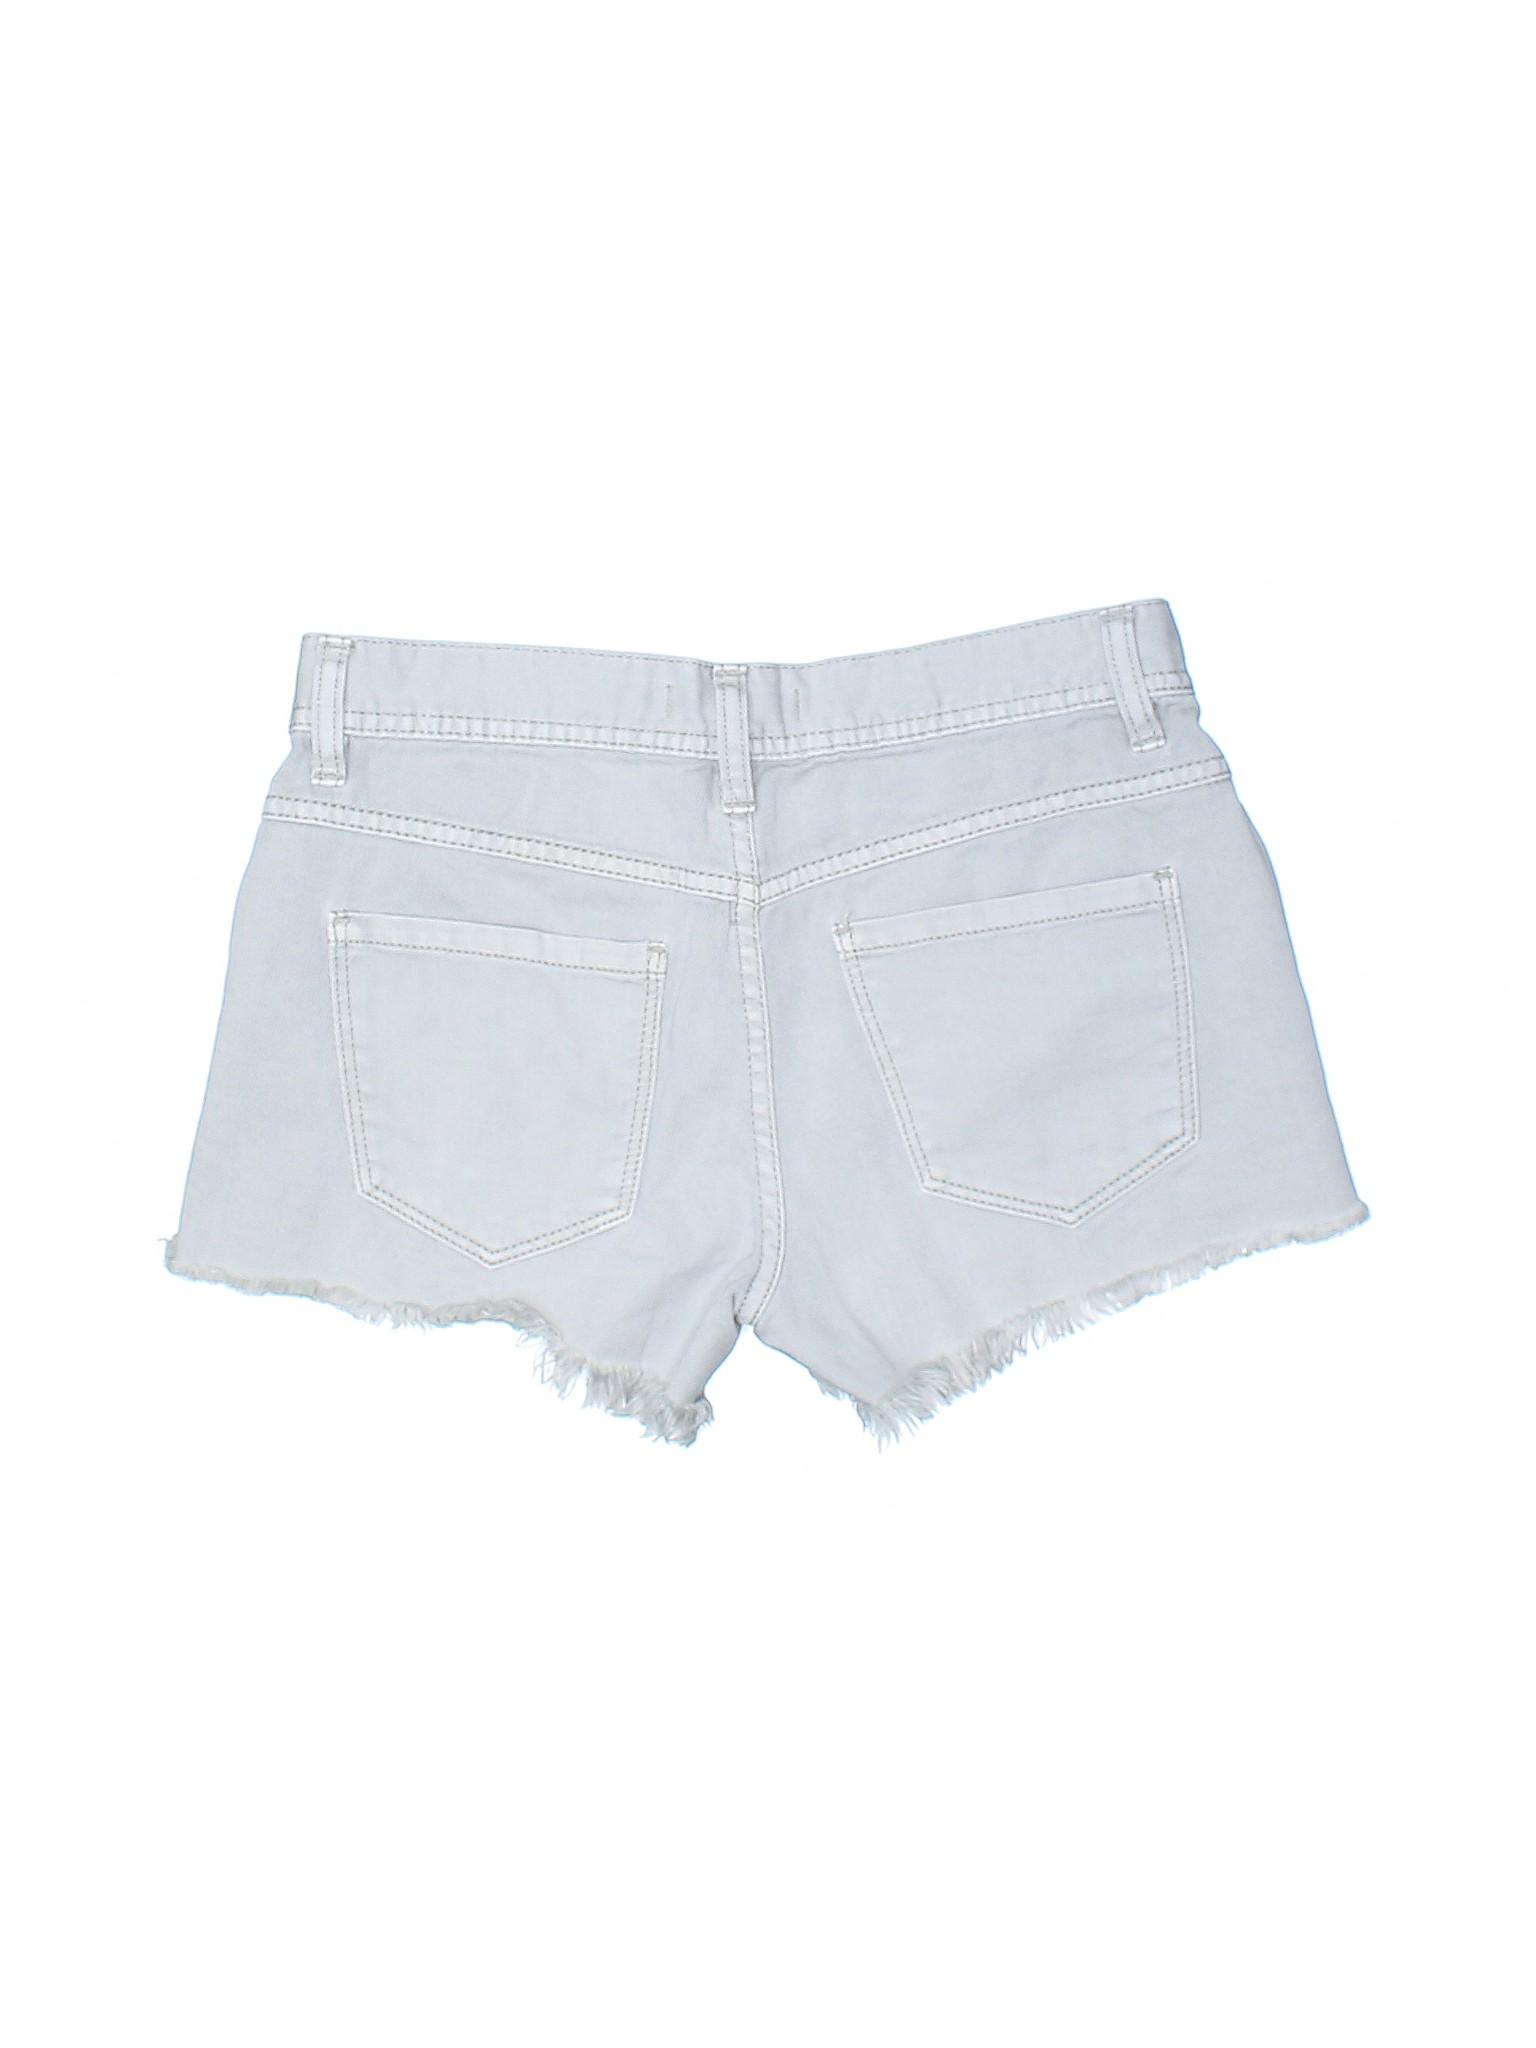 Boutique Shorts Denim Free leisure People HFqXwFPr